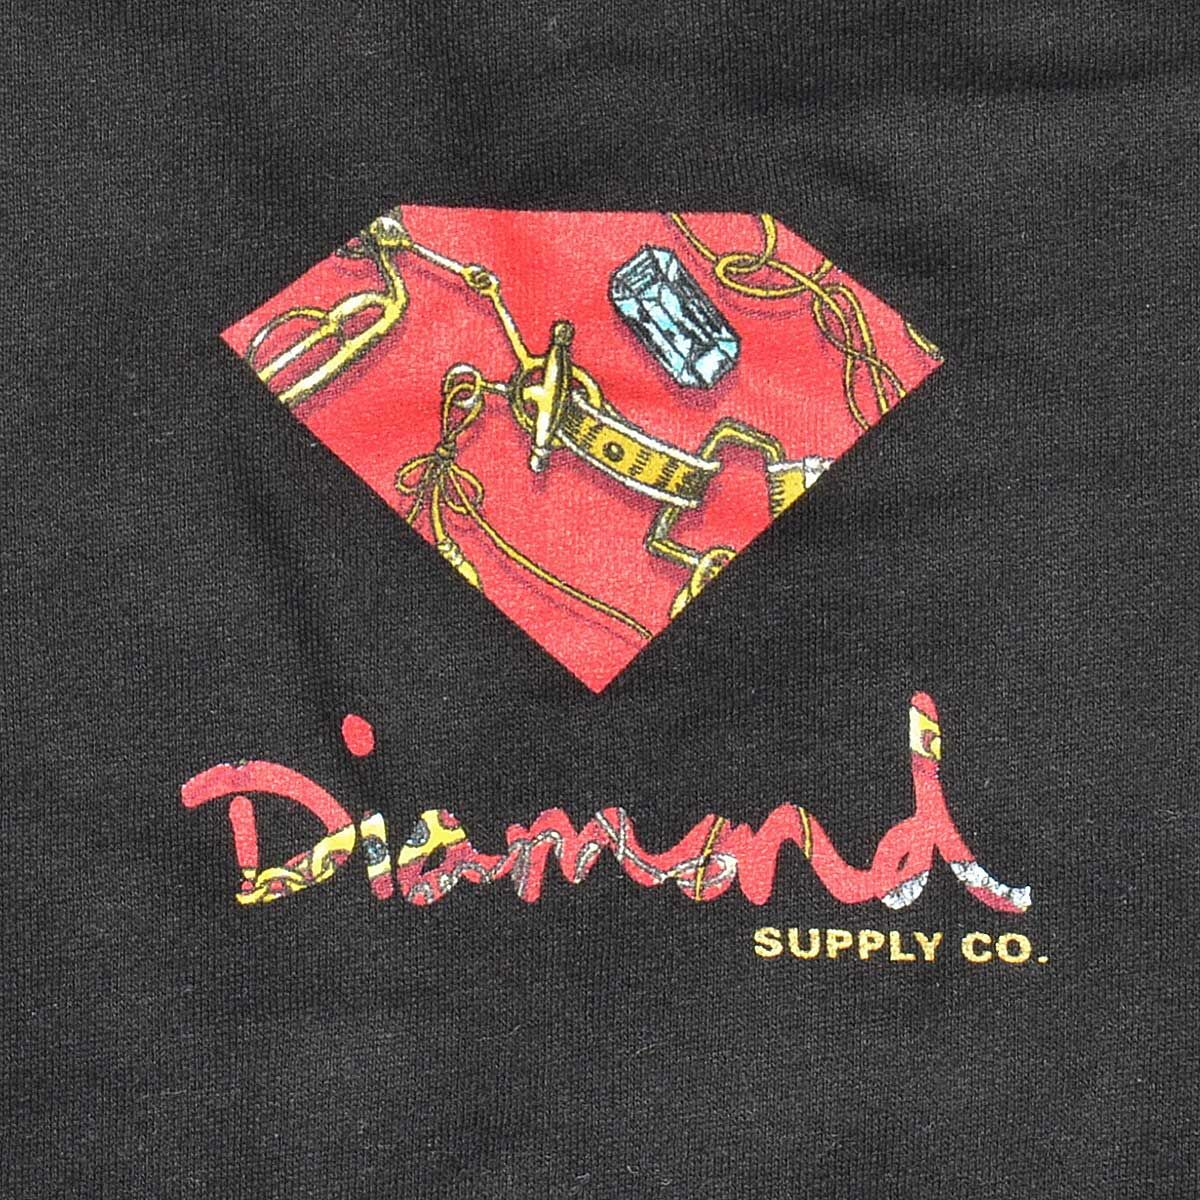 Diamond supply co wallpaper hd wallpapers pinterest diamond diamond supply co wallpaper hd voltagebd Choice Image